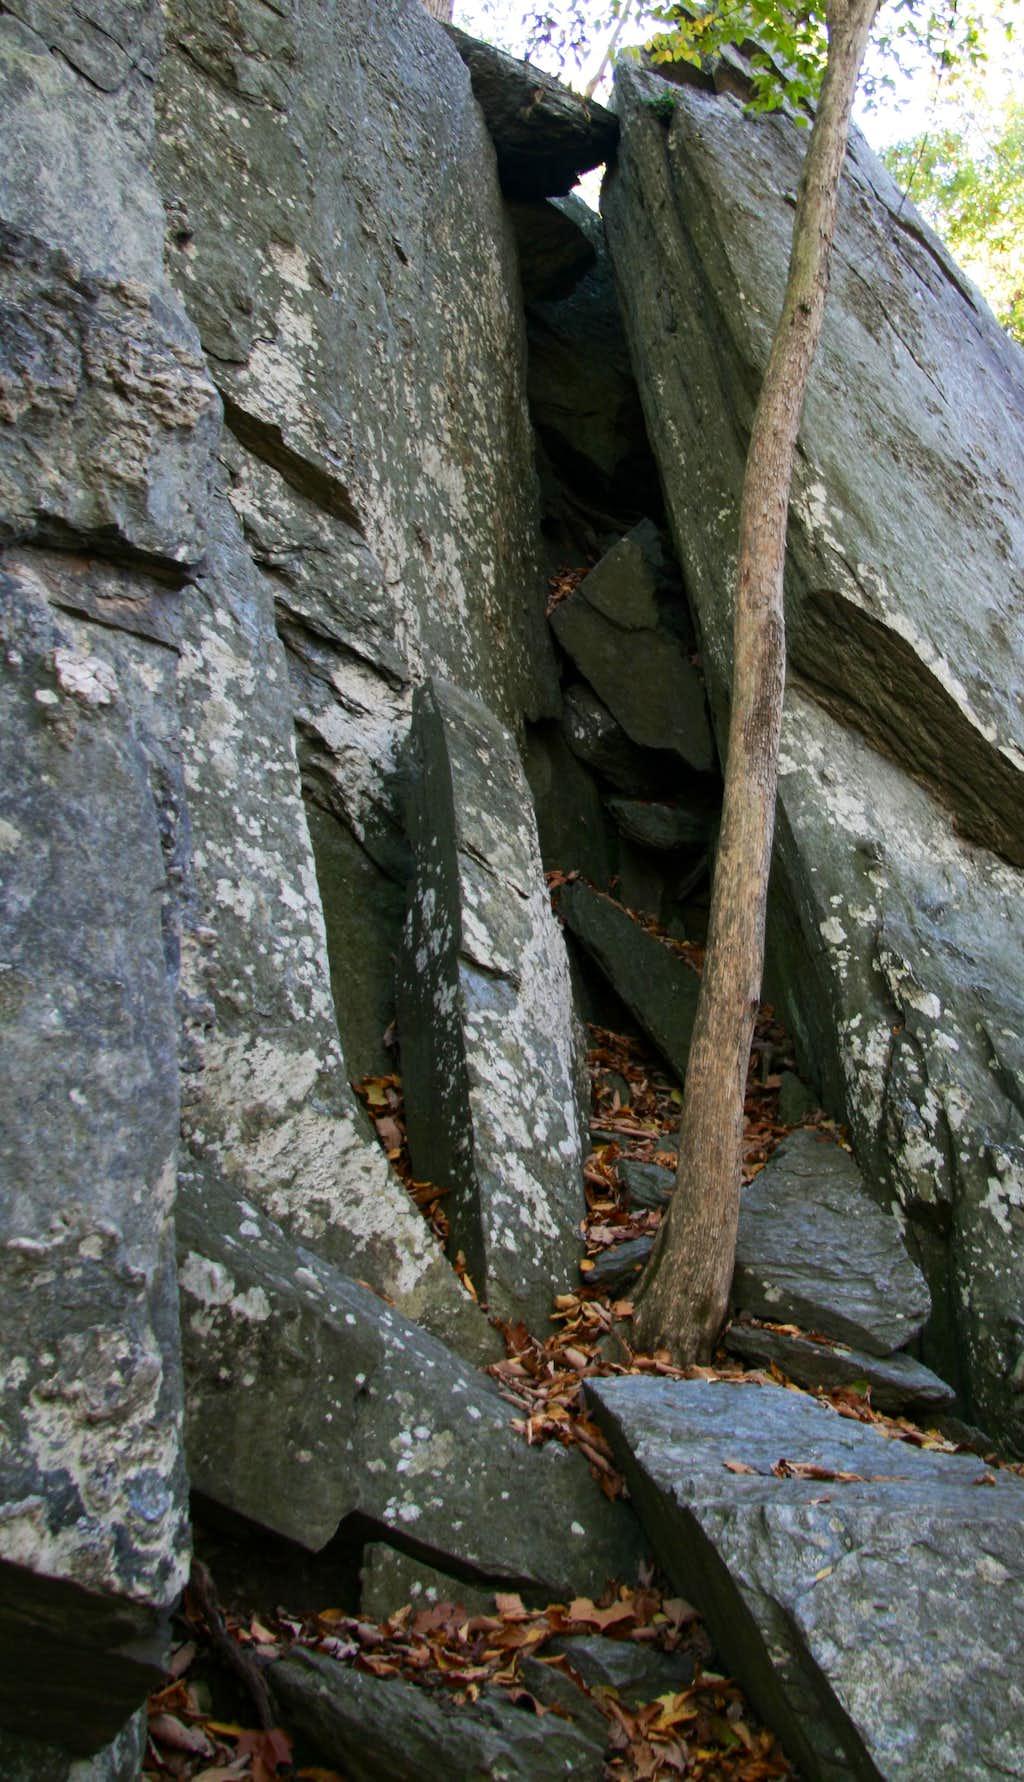 Carderock-- Chockstone Chimney (5.3)